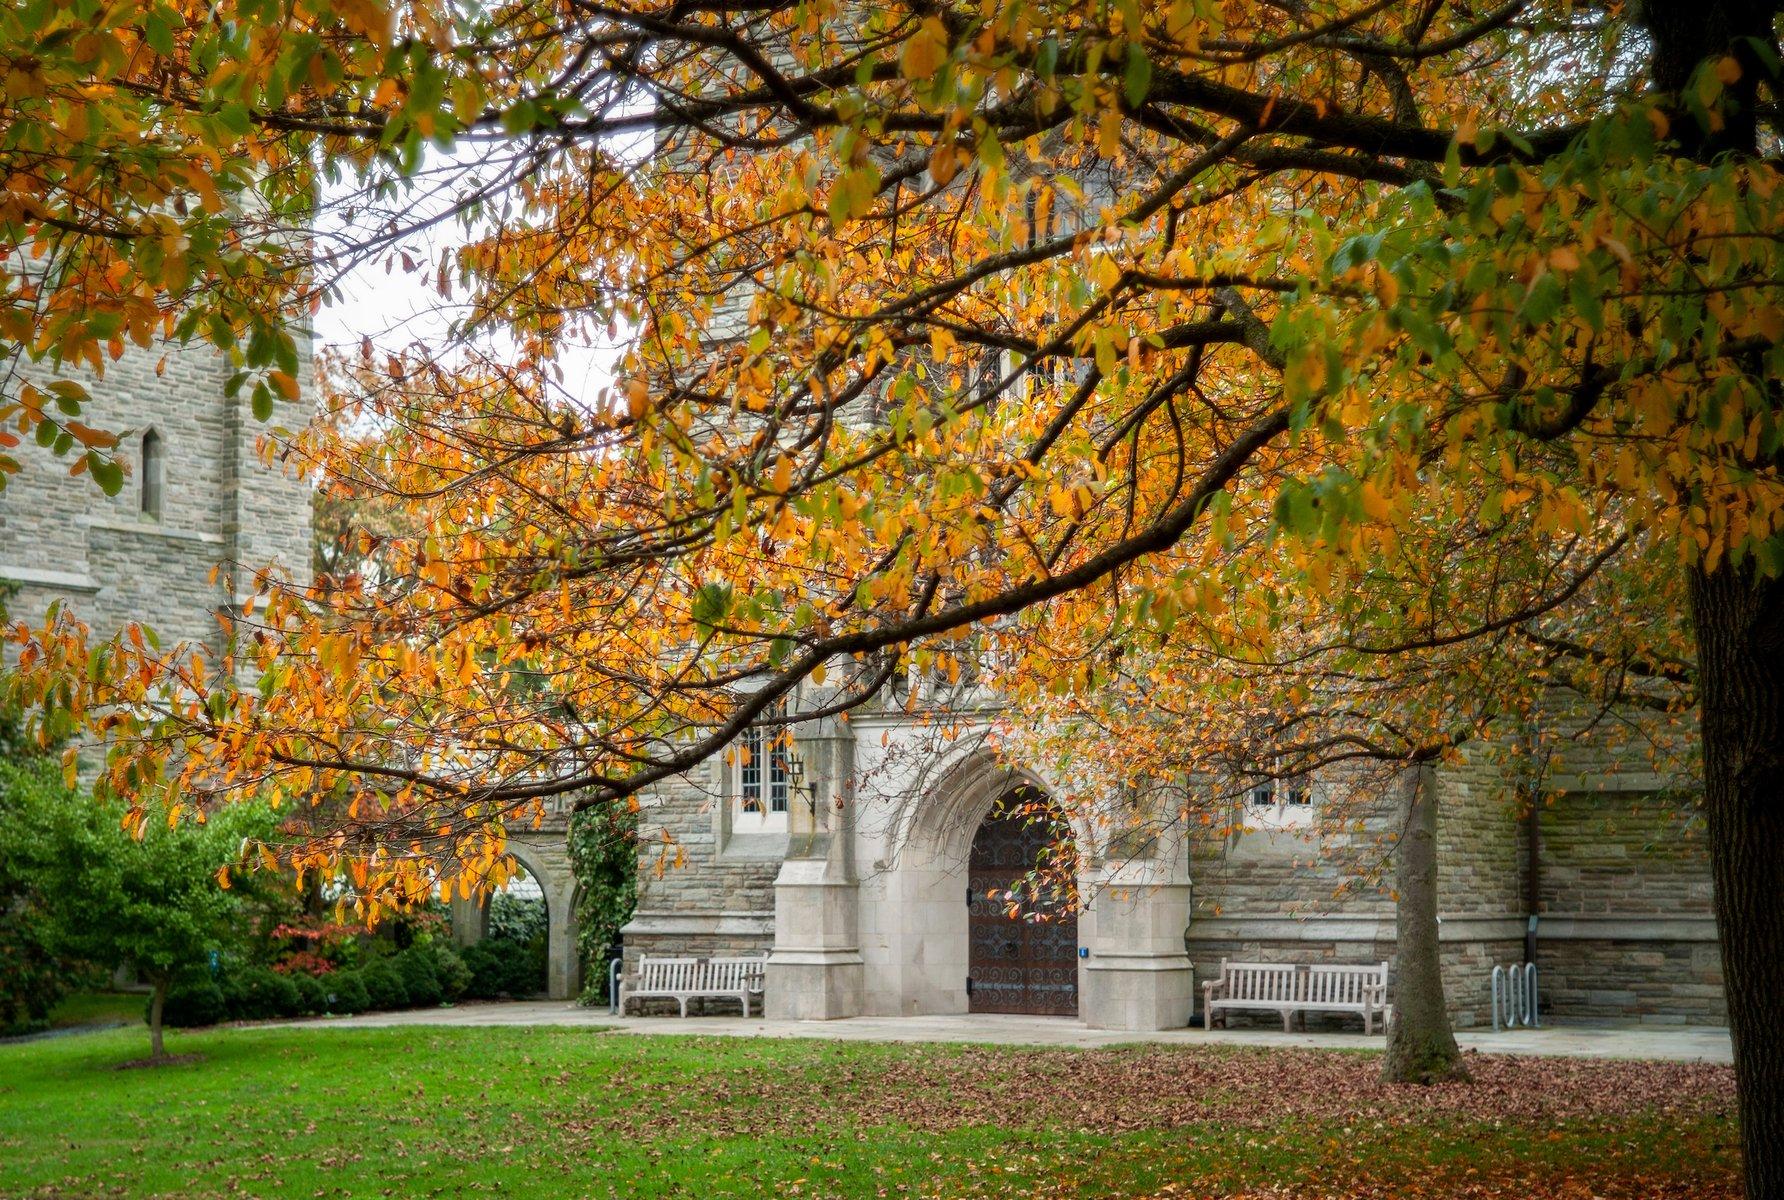 Swarthmore College beautiful fall foliage at building